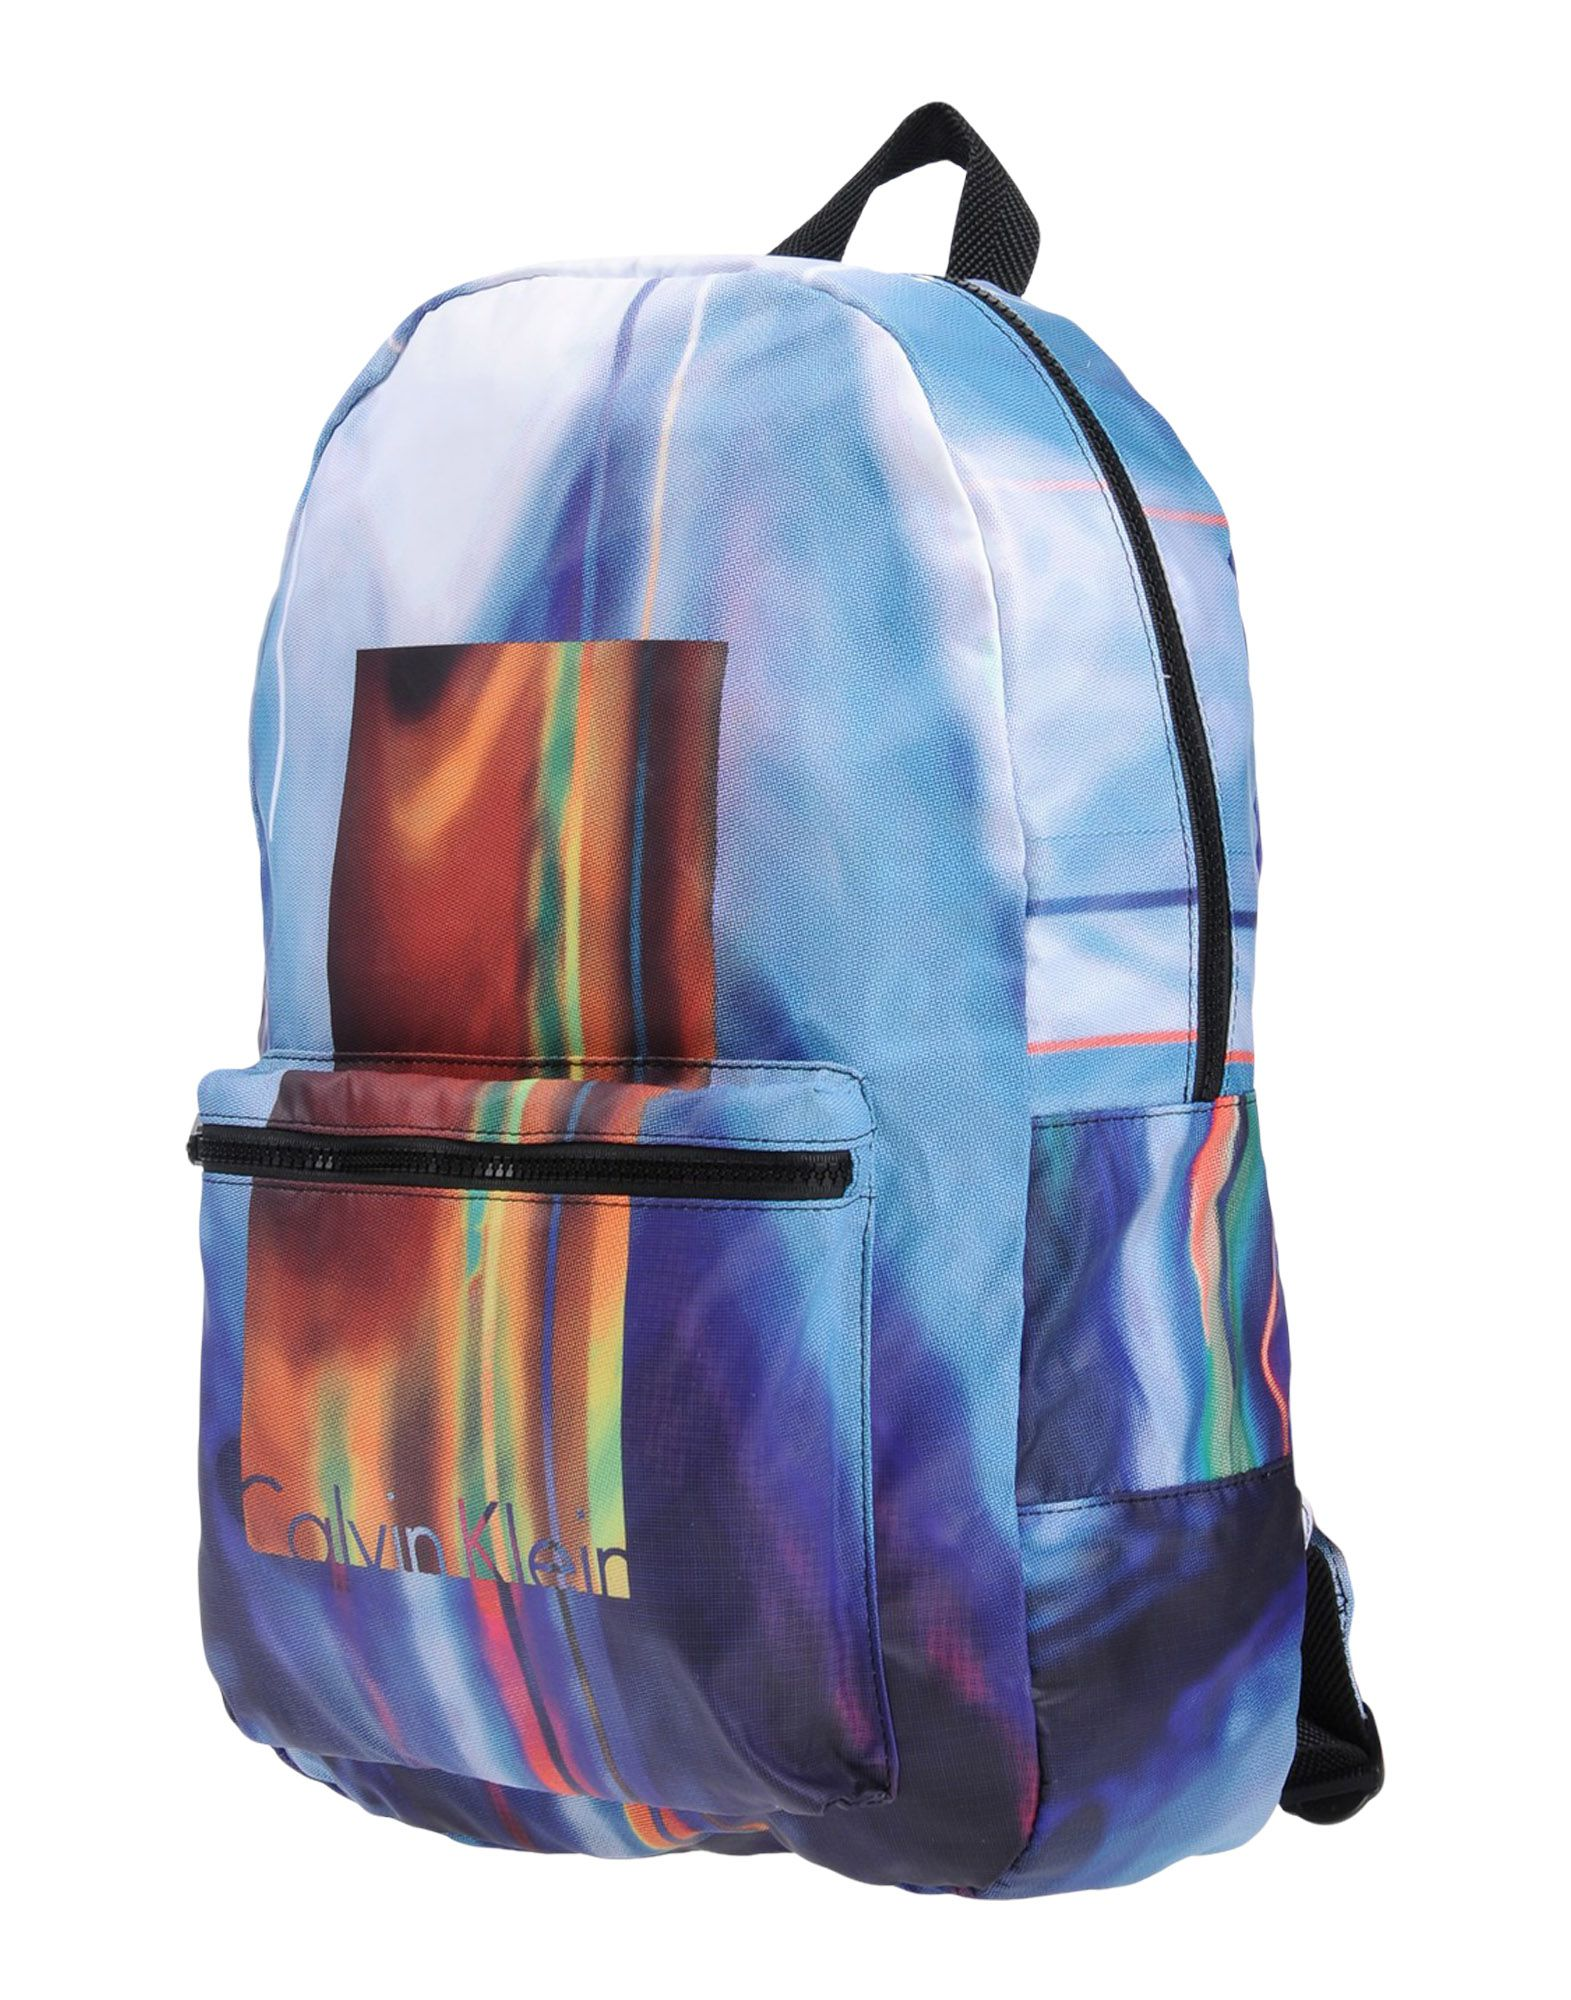 CALVIN KLEIN JEANS Рюкзаки и сумки на пояс calvin klein jeans k60k601005